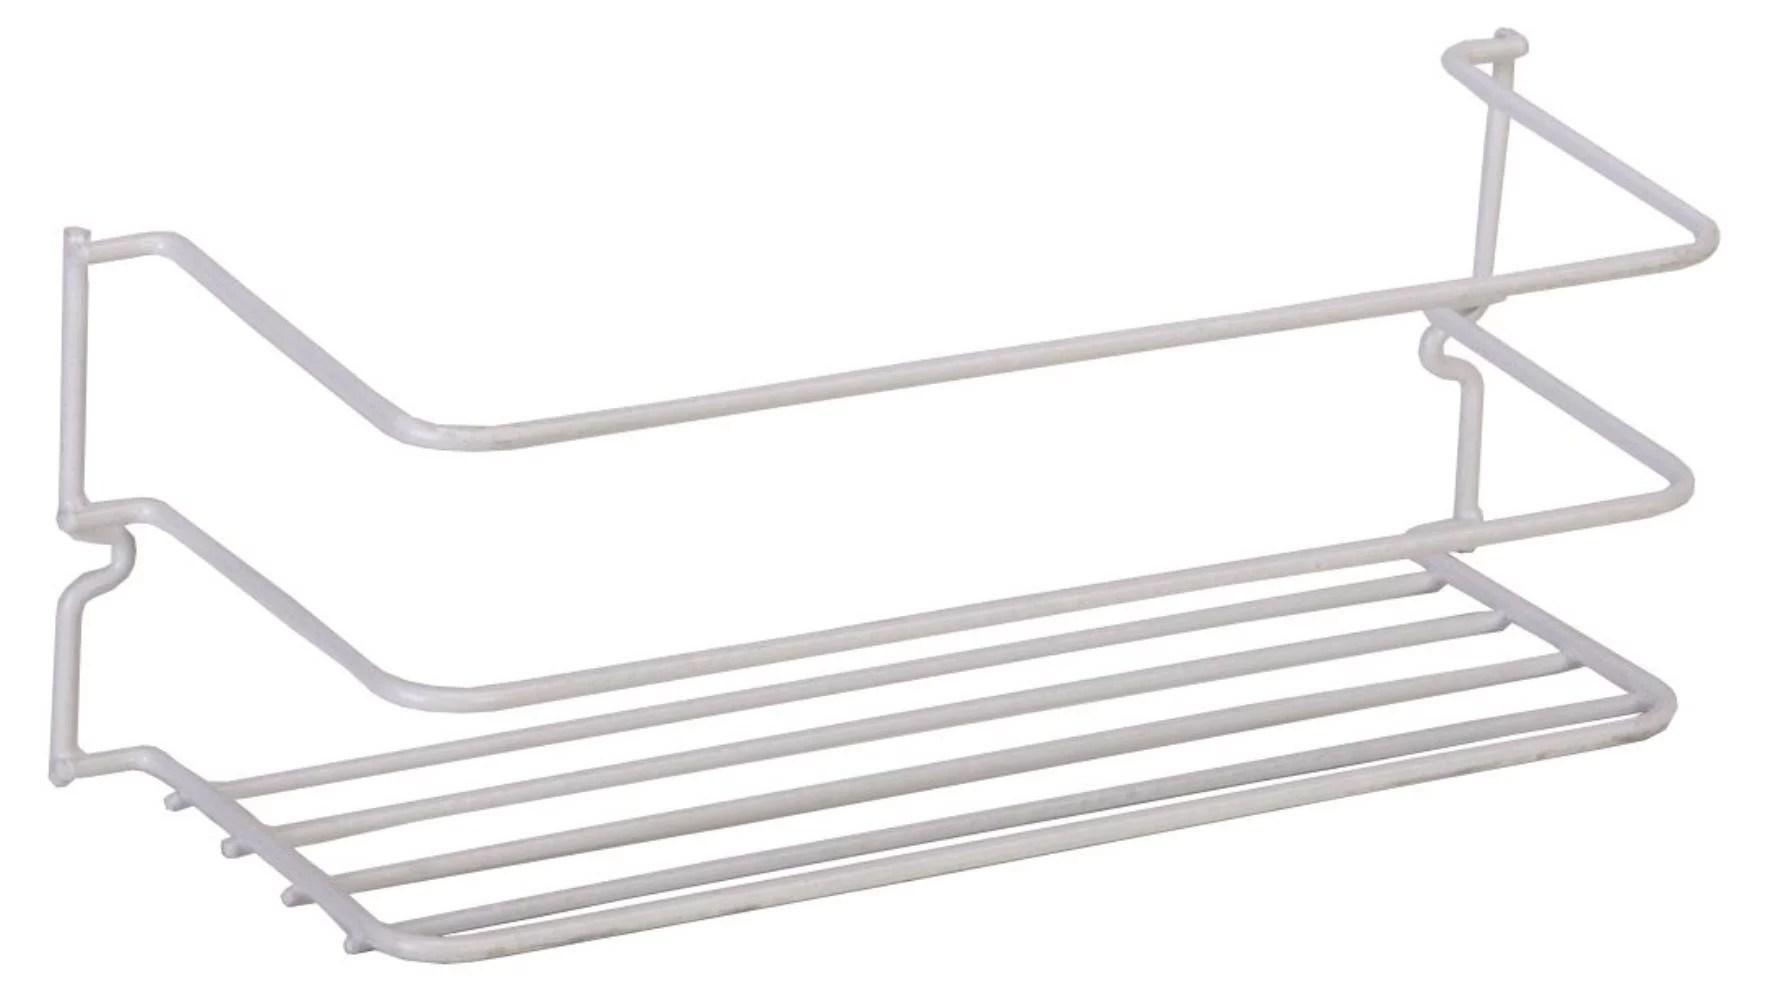 40501, Large Cabinet Rack, White, Grayline 40501 12 X 4 X